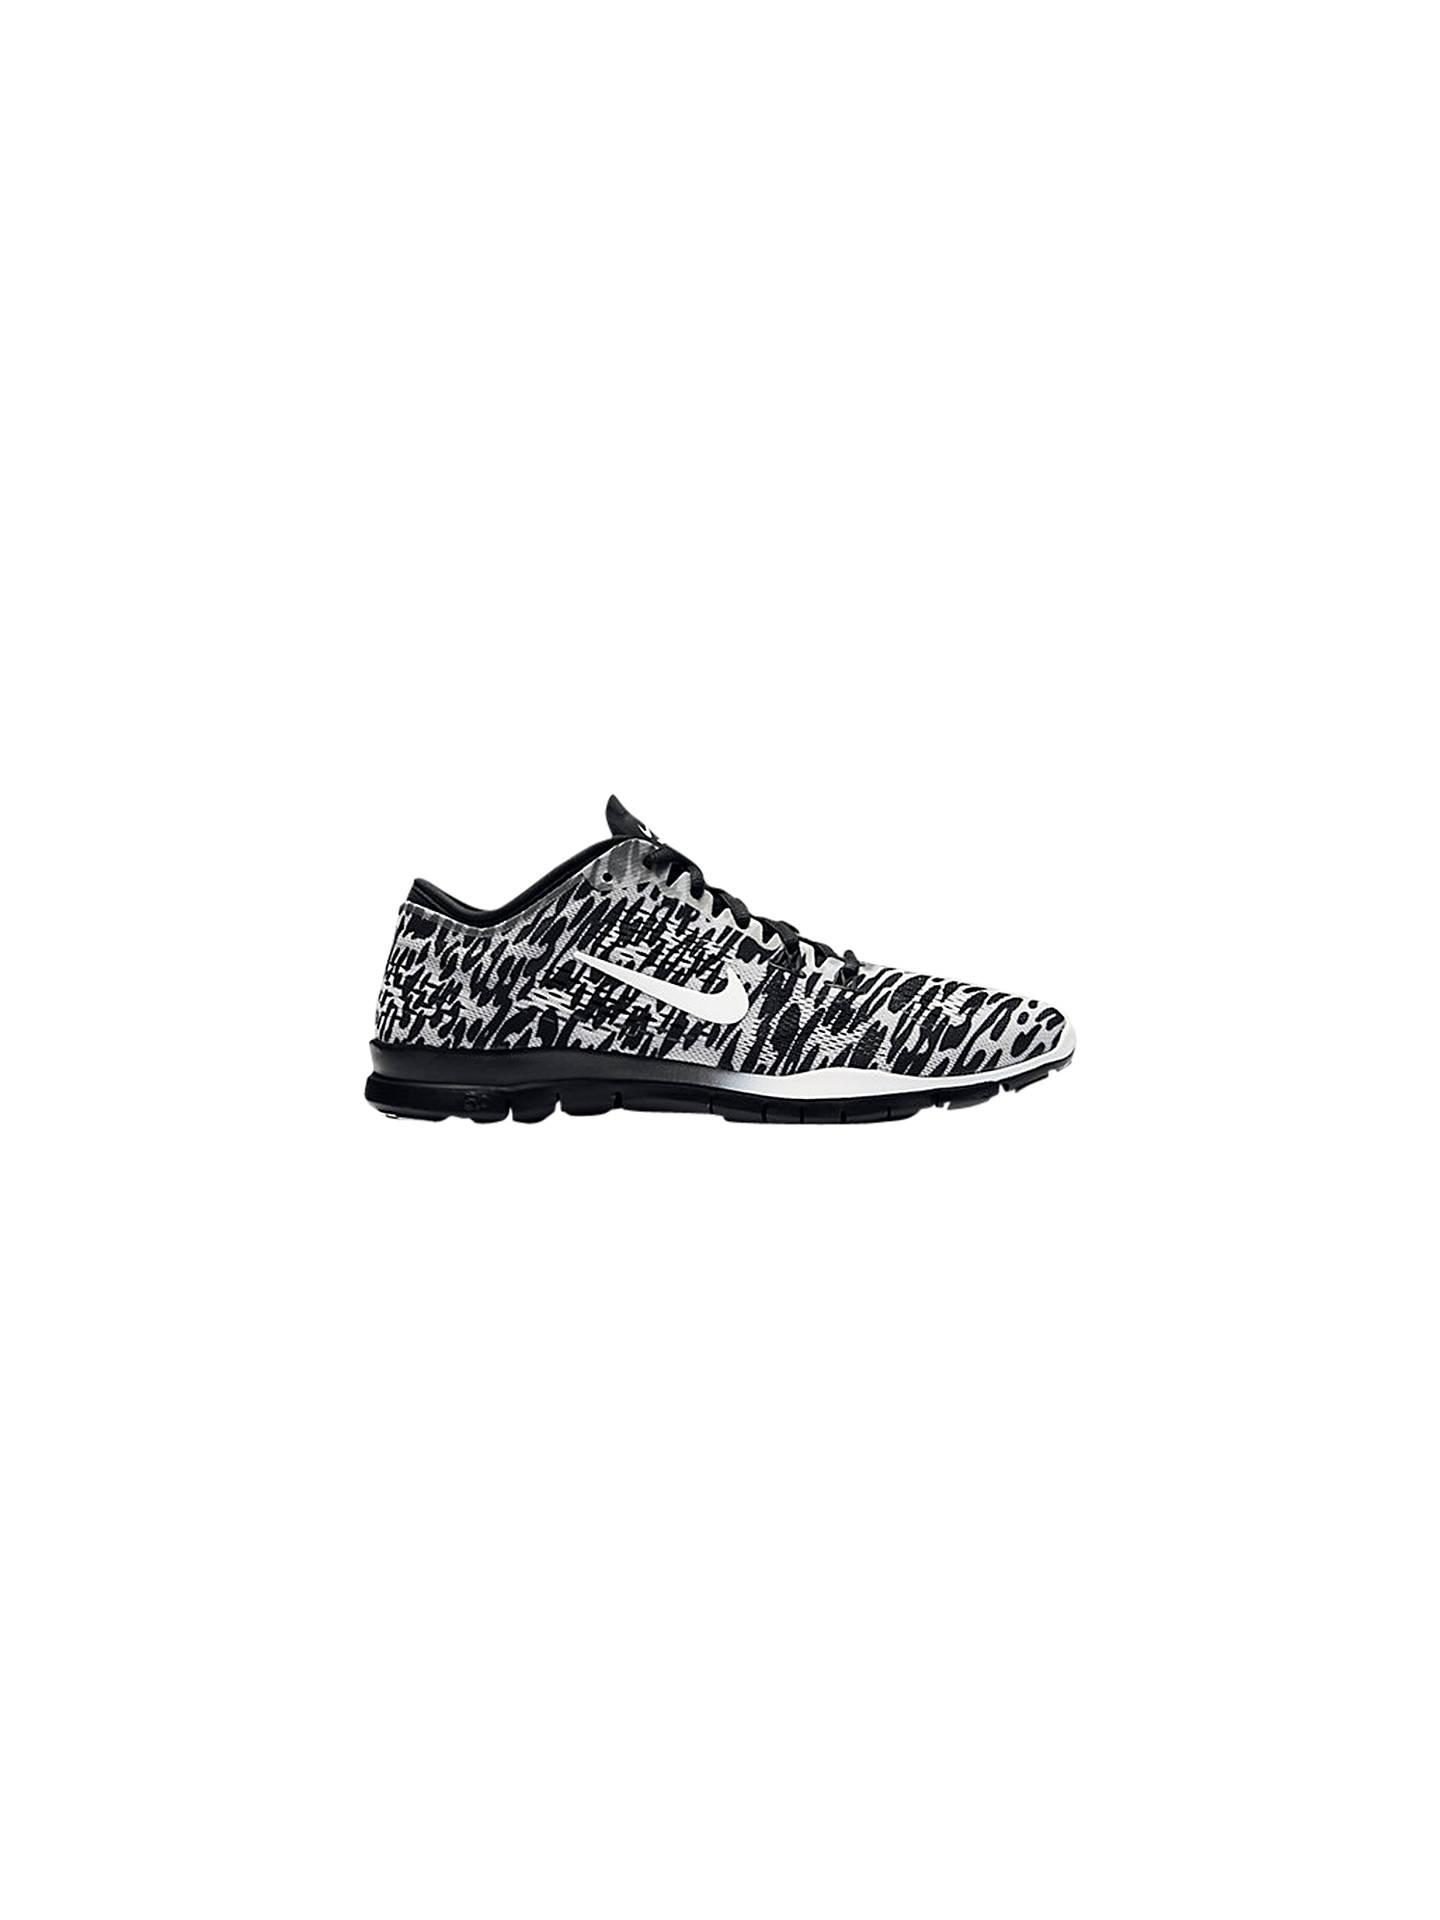 online retailer 3bbb3 2e115 Nike Free 5.0 Cheetah Print Women's Cross Trainers at John ...